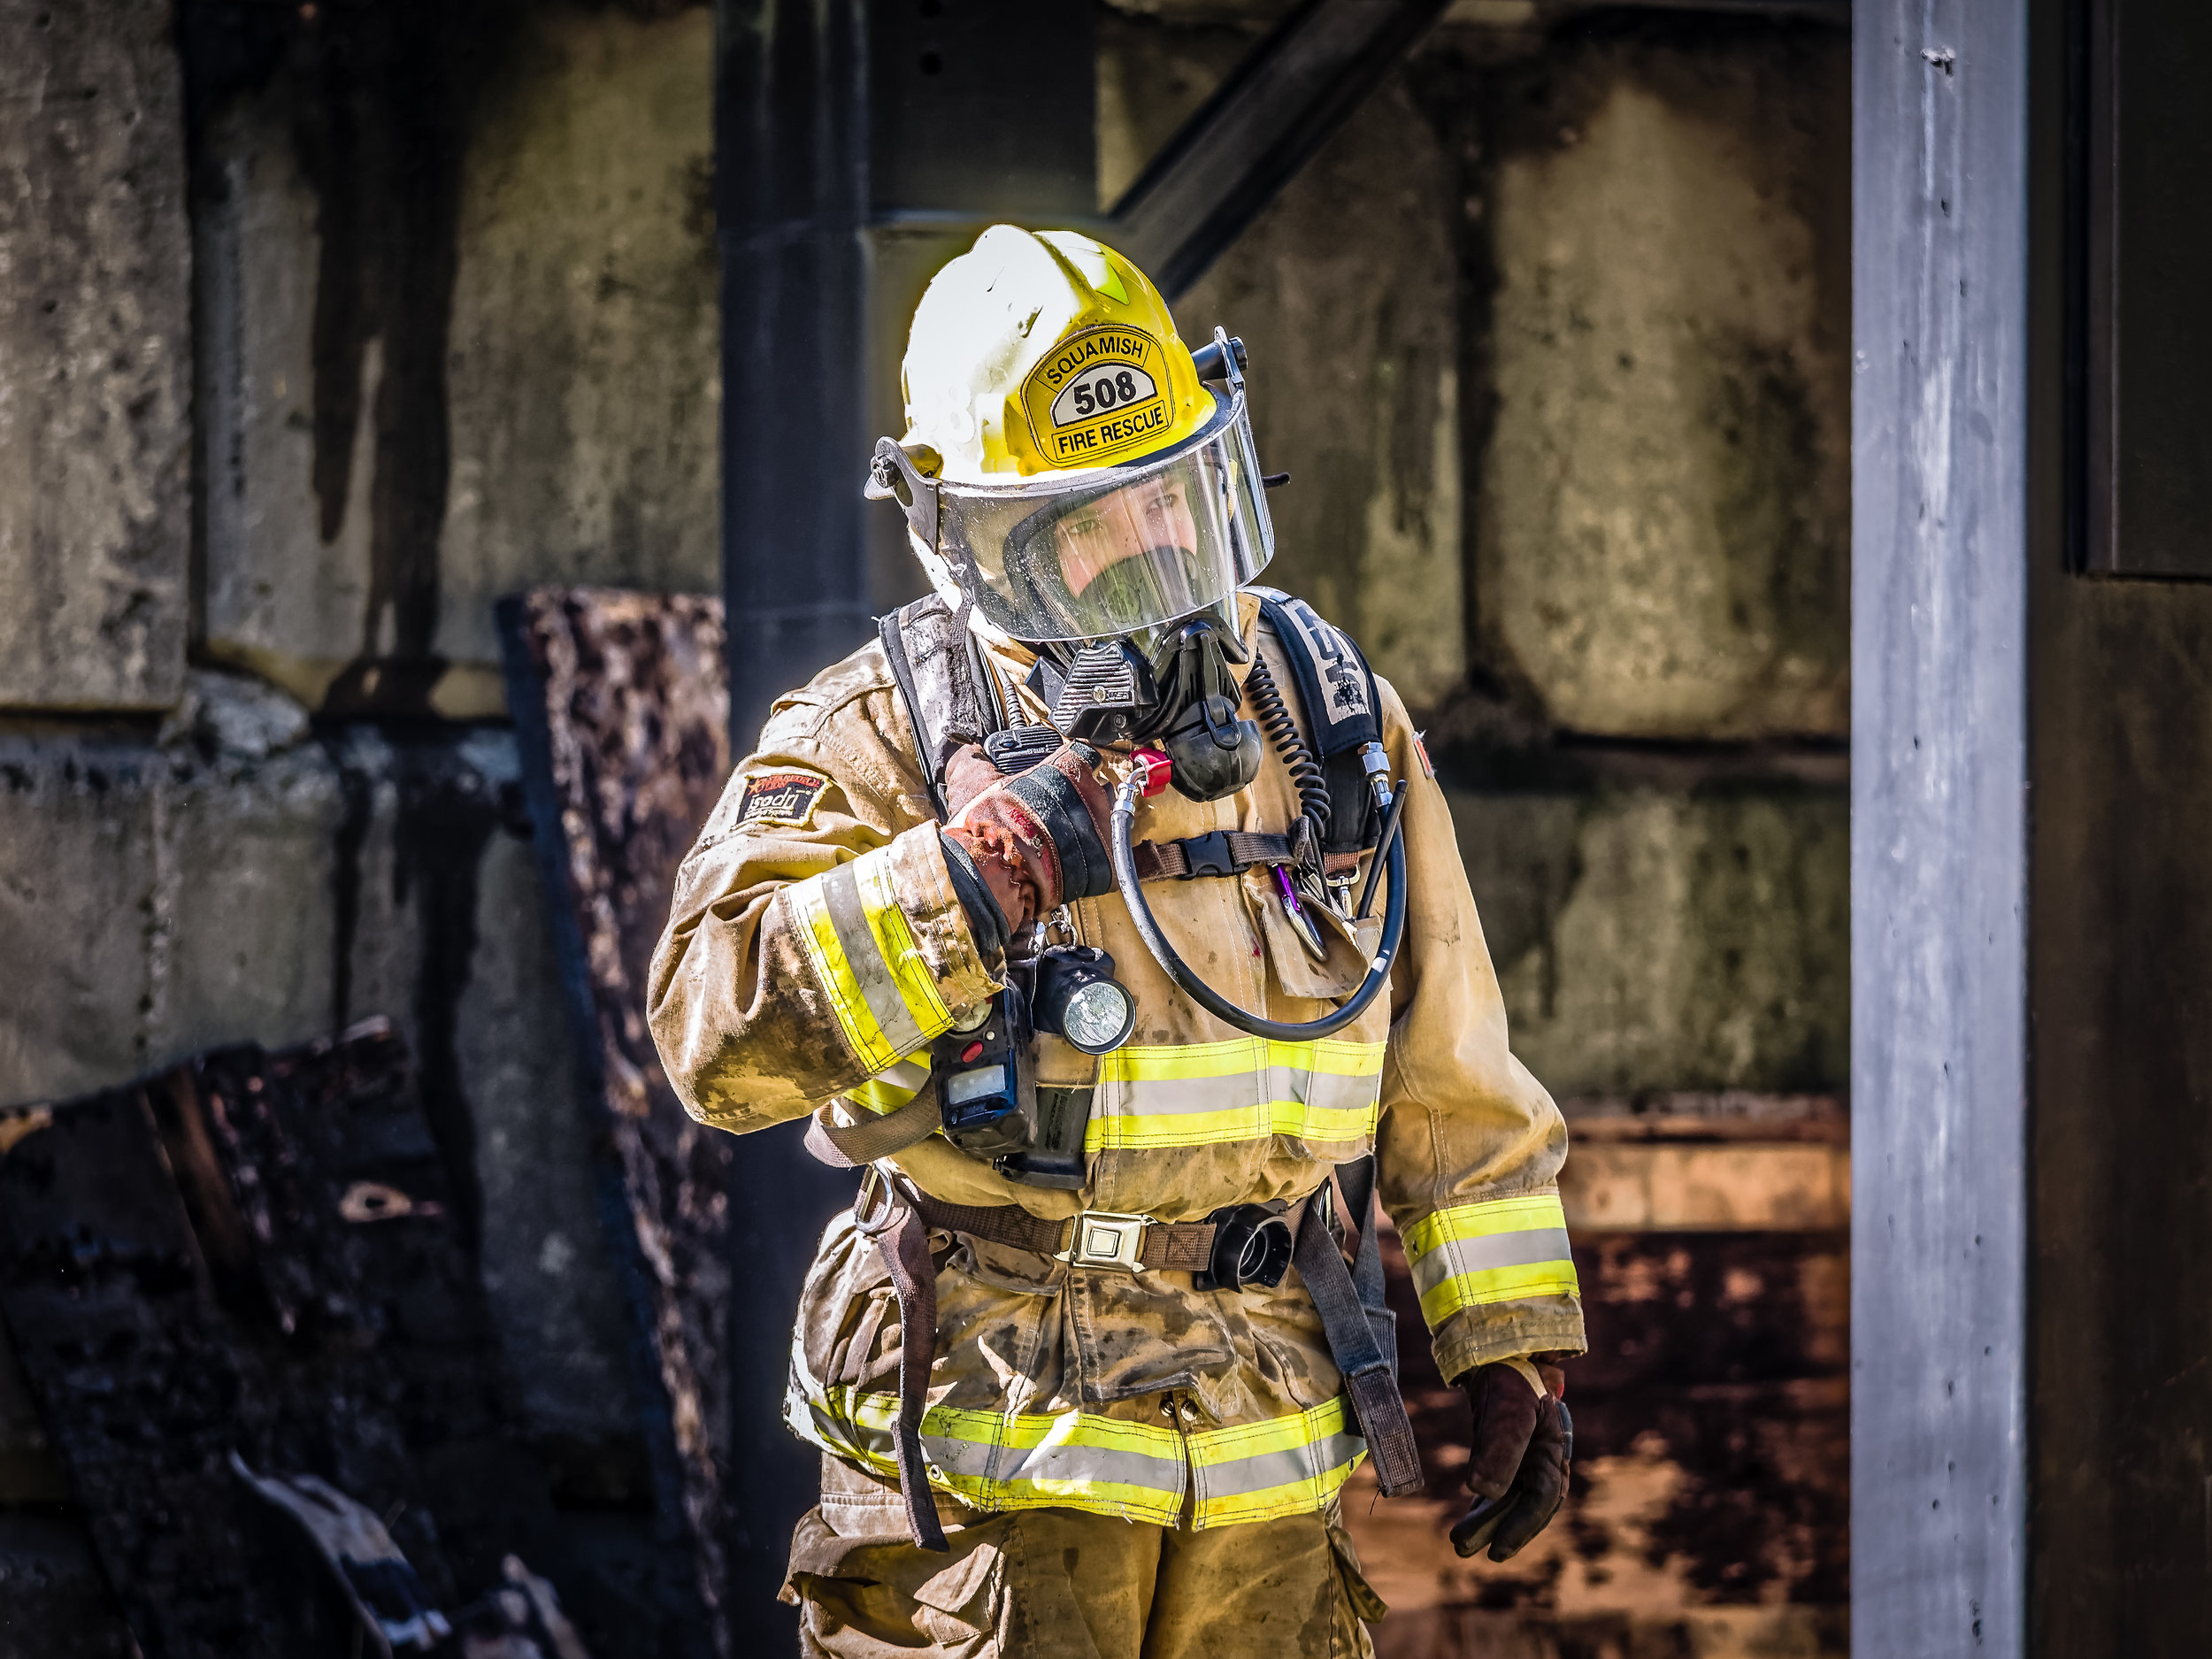 Jasmine firefighting in squamish